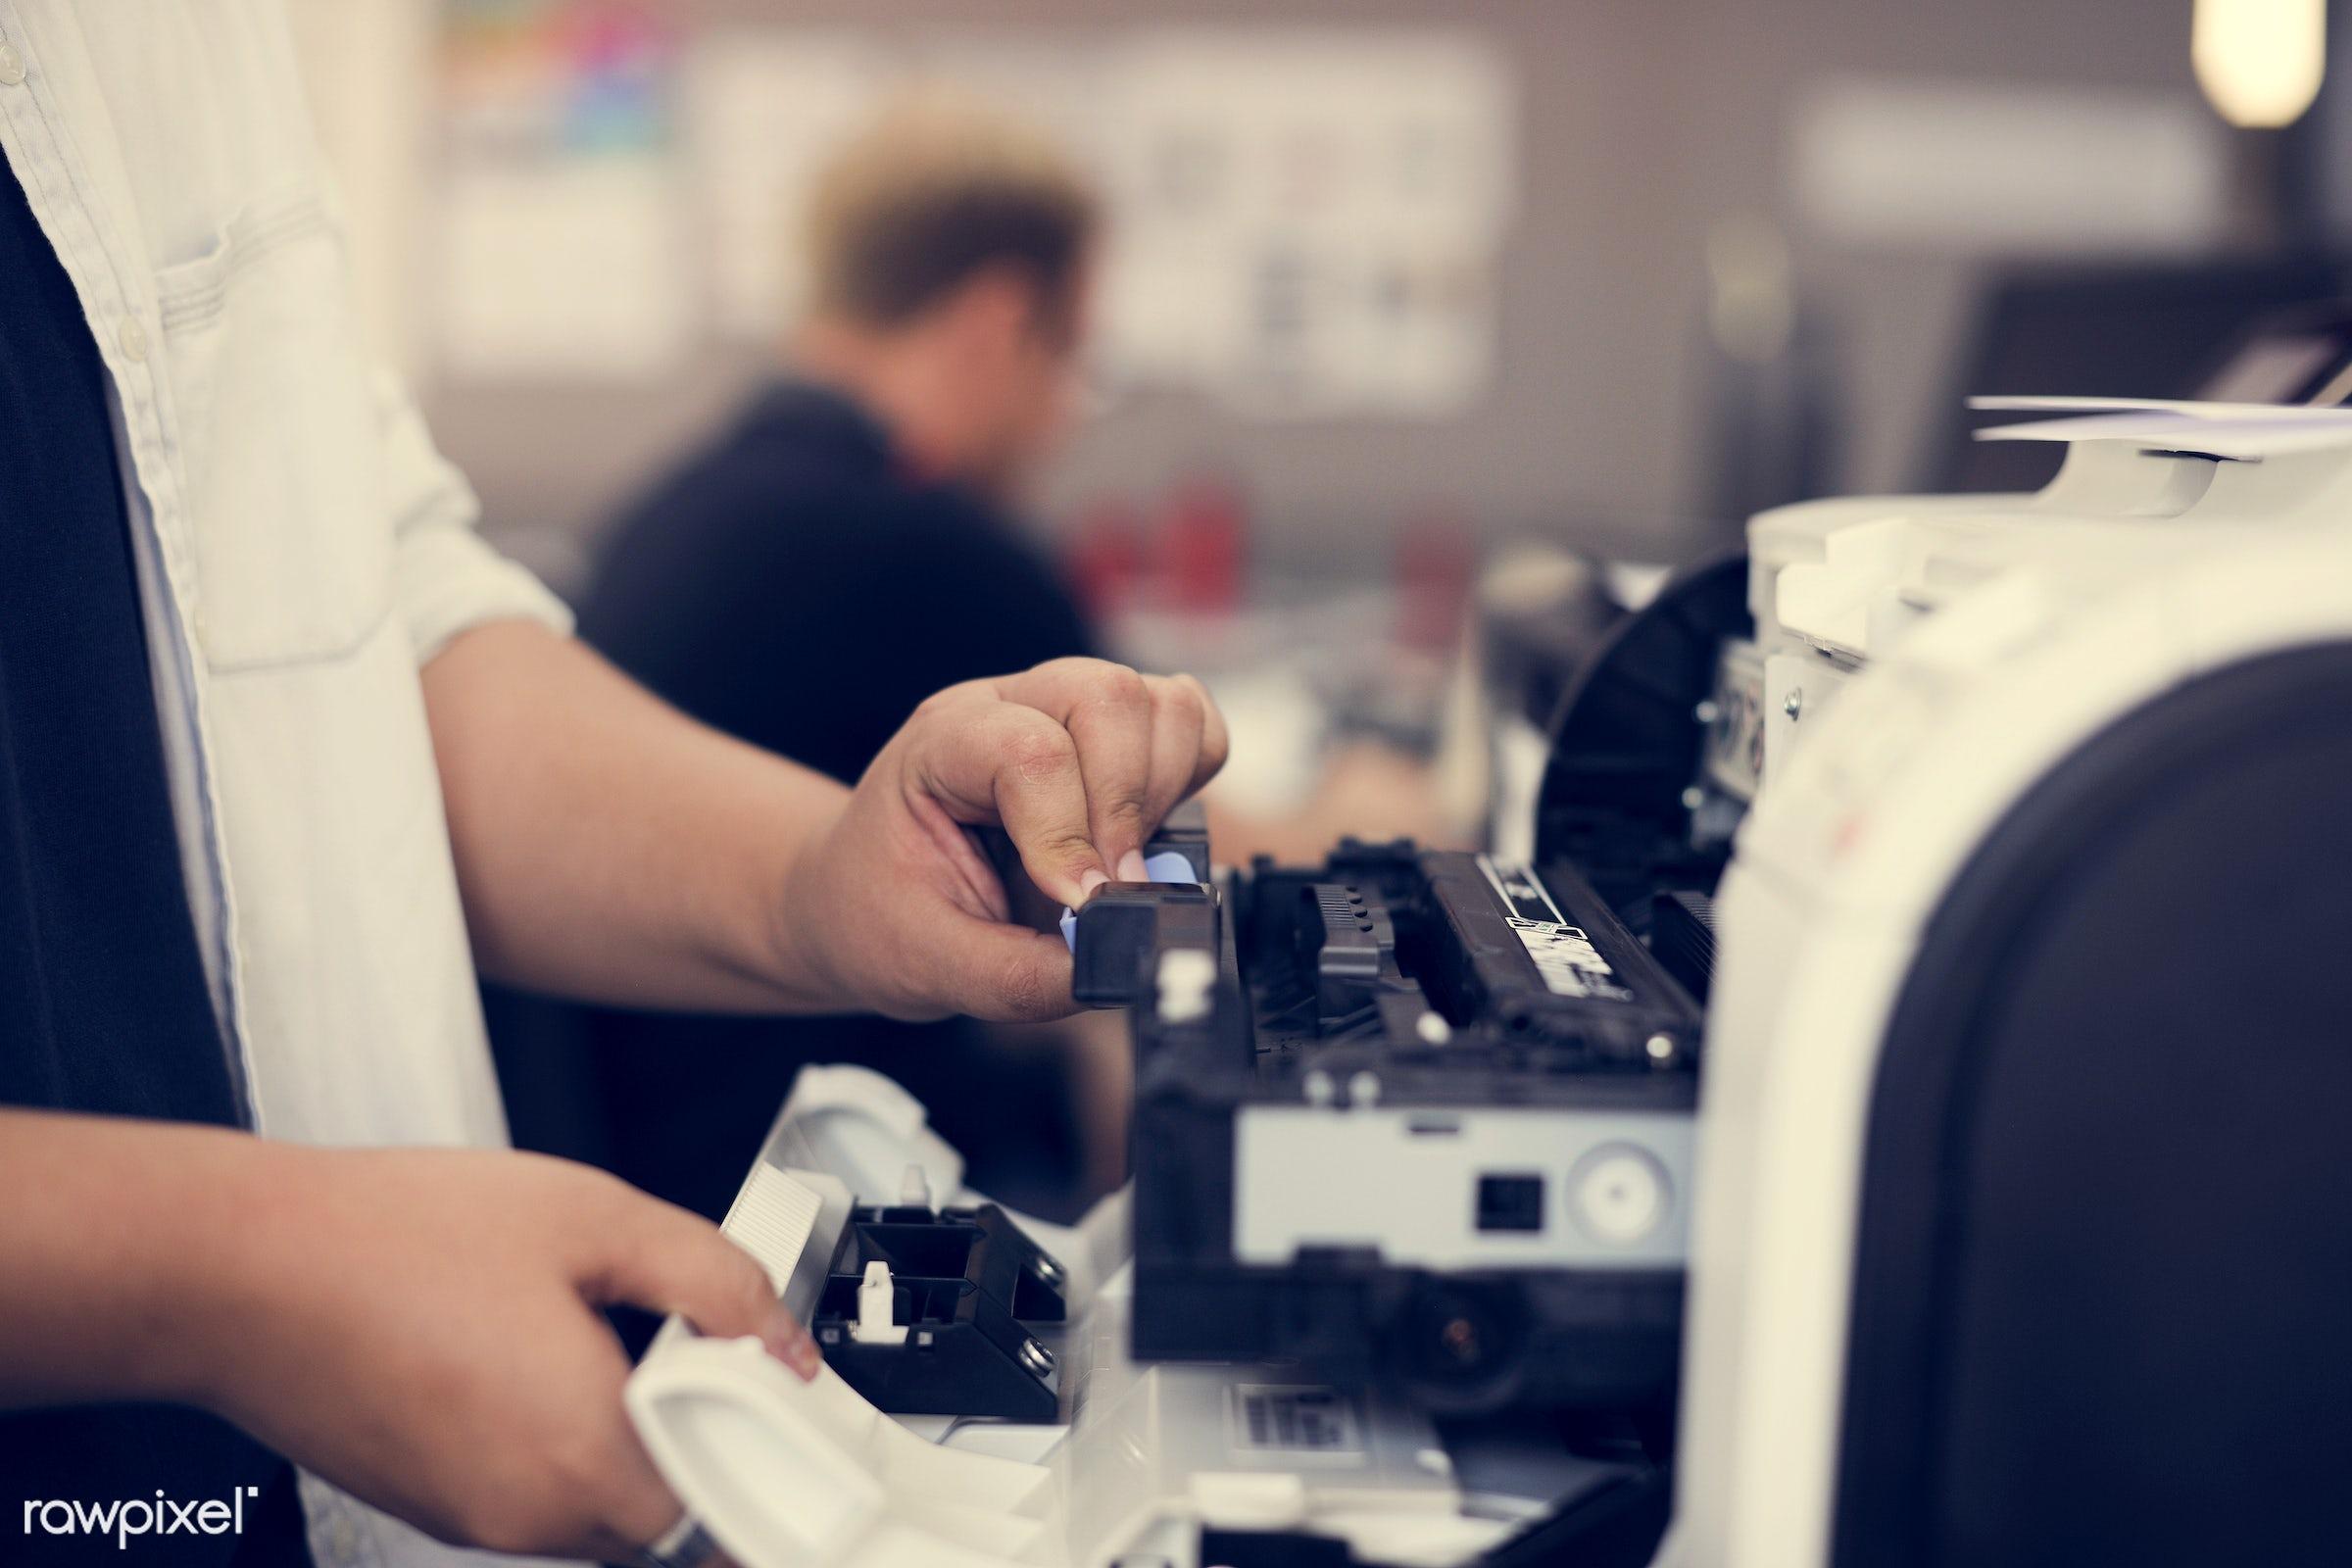 printer, change, checking, closeup, diagnostic, equipment, fixing, hand, hands, ink, insert, instrument, machine,...